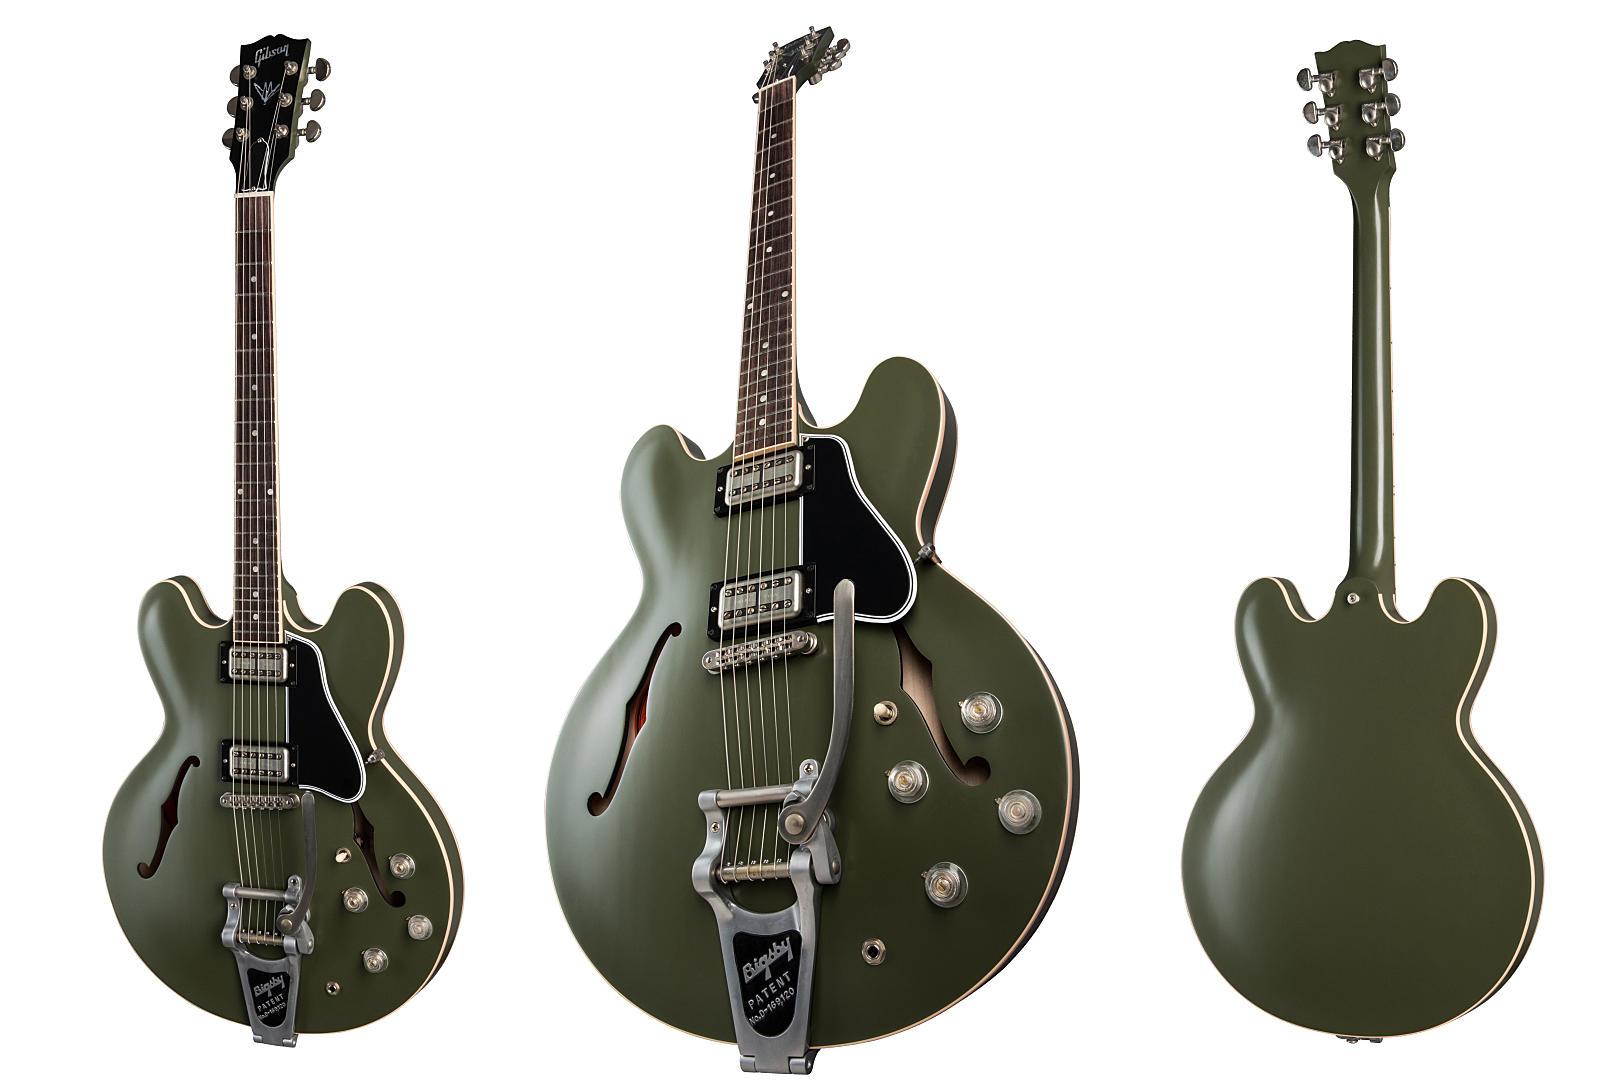 Gibson Announces Chris Cornell Signature Model Tribute Guitar